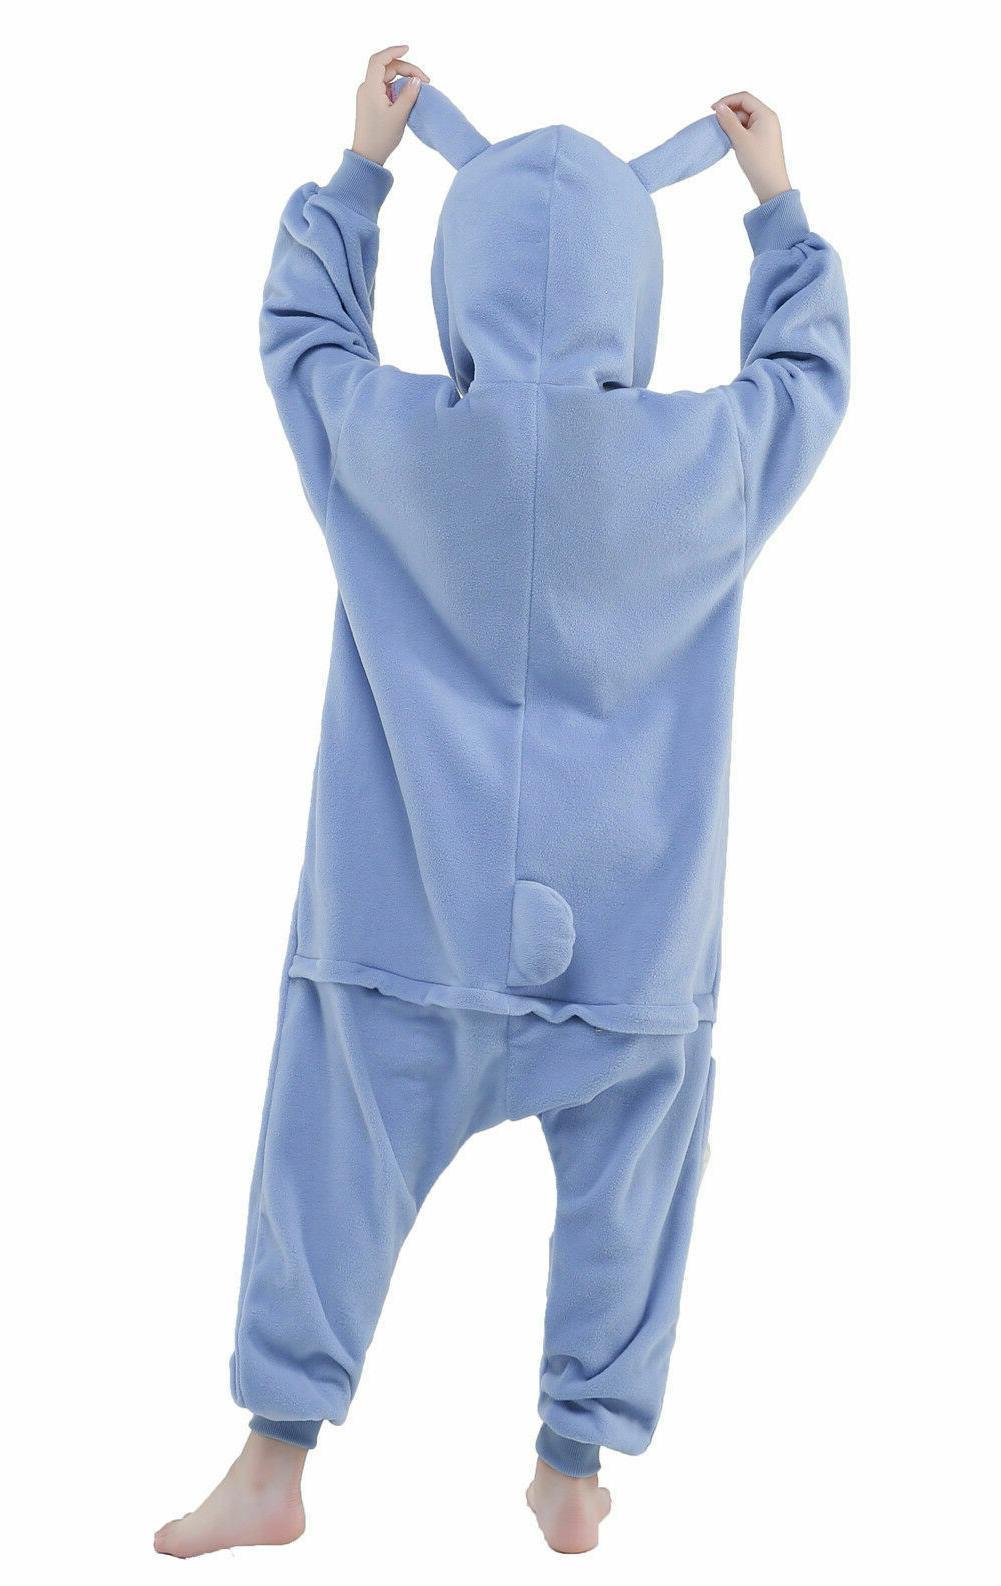 NEWCOSPLAY One Piece pajamas Cosplay Costume, Blue Stitch